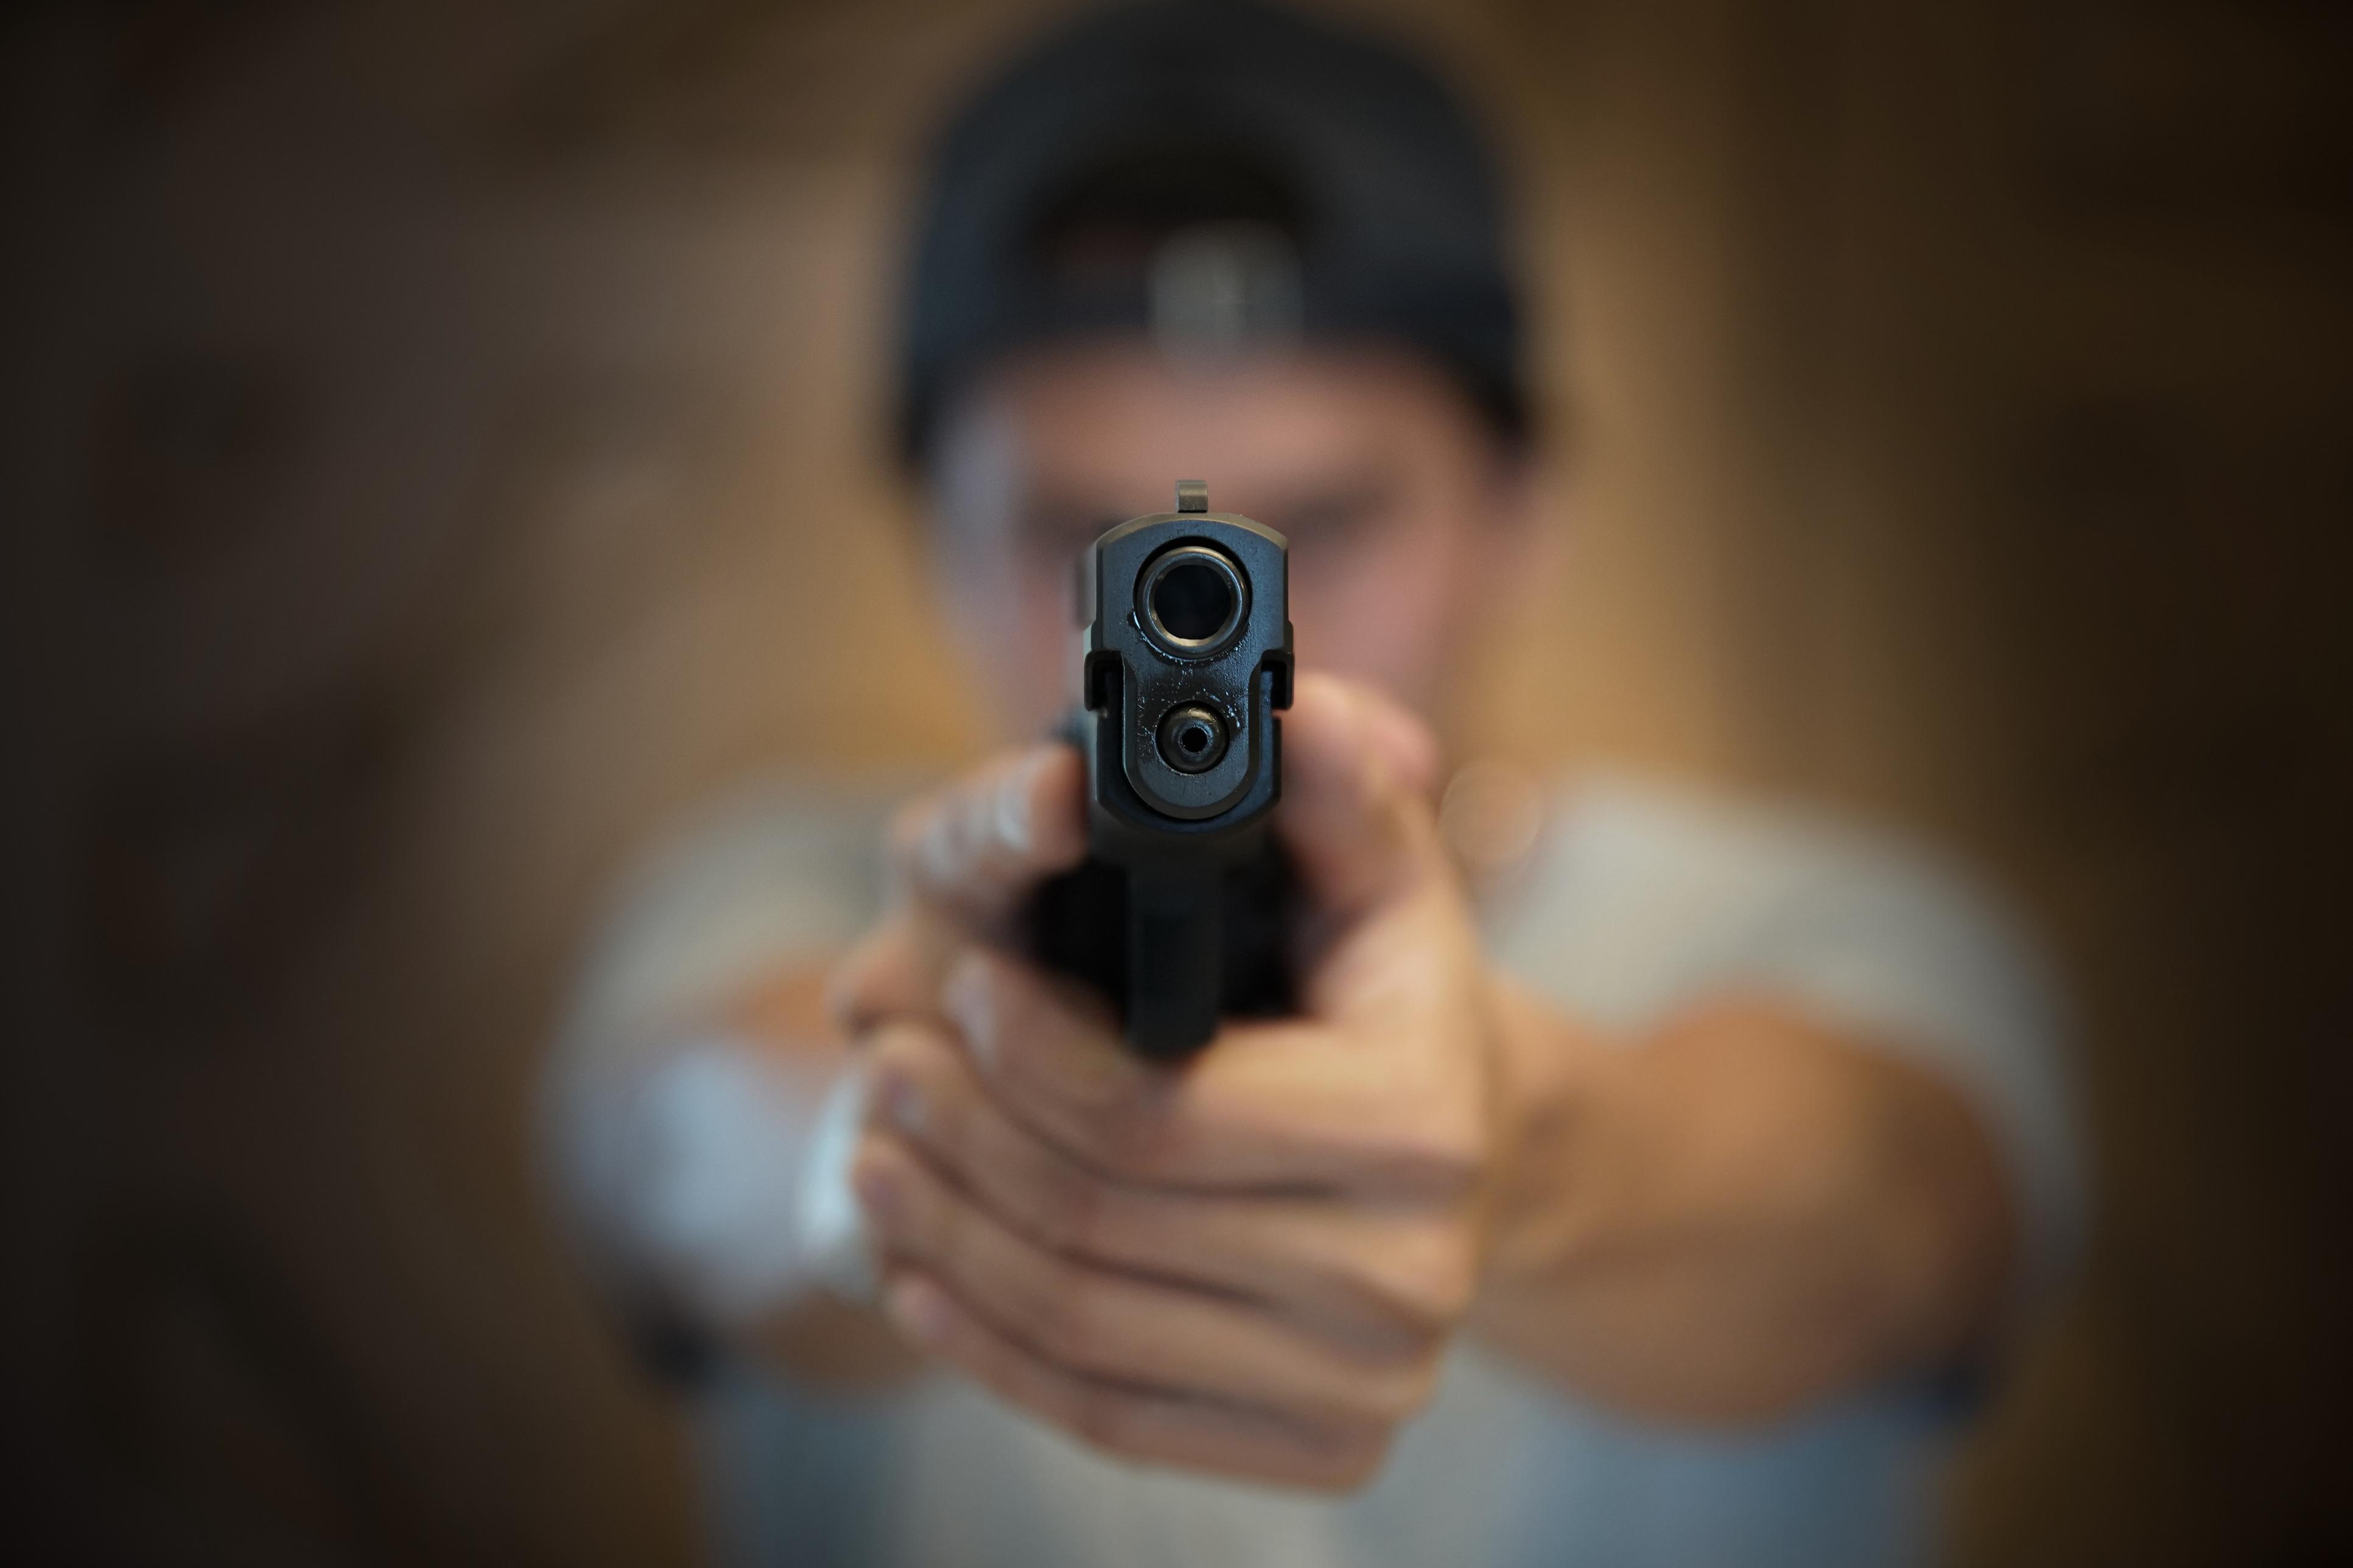 Photo of האדם הלא נכון במקום הלא נכון. תושב חדרה שדד חנות נוחות בתחנת דלק בעיר, לצערו גם בלשים של המשטרה היו במקרה באזור